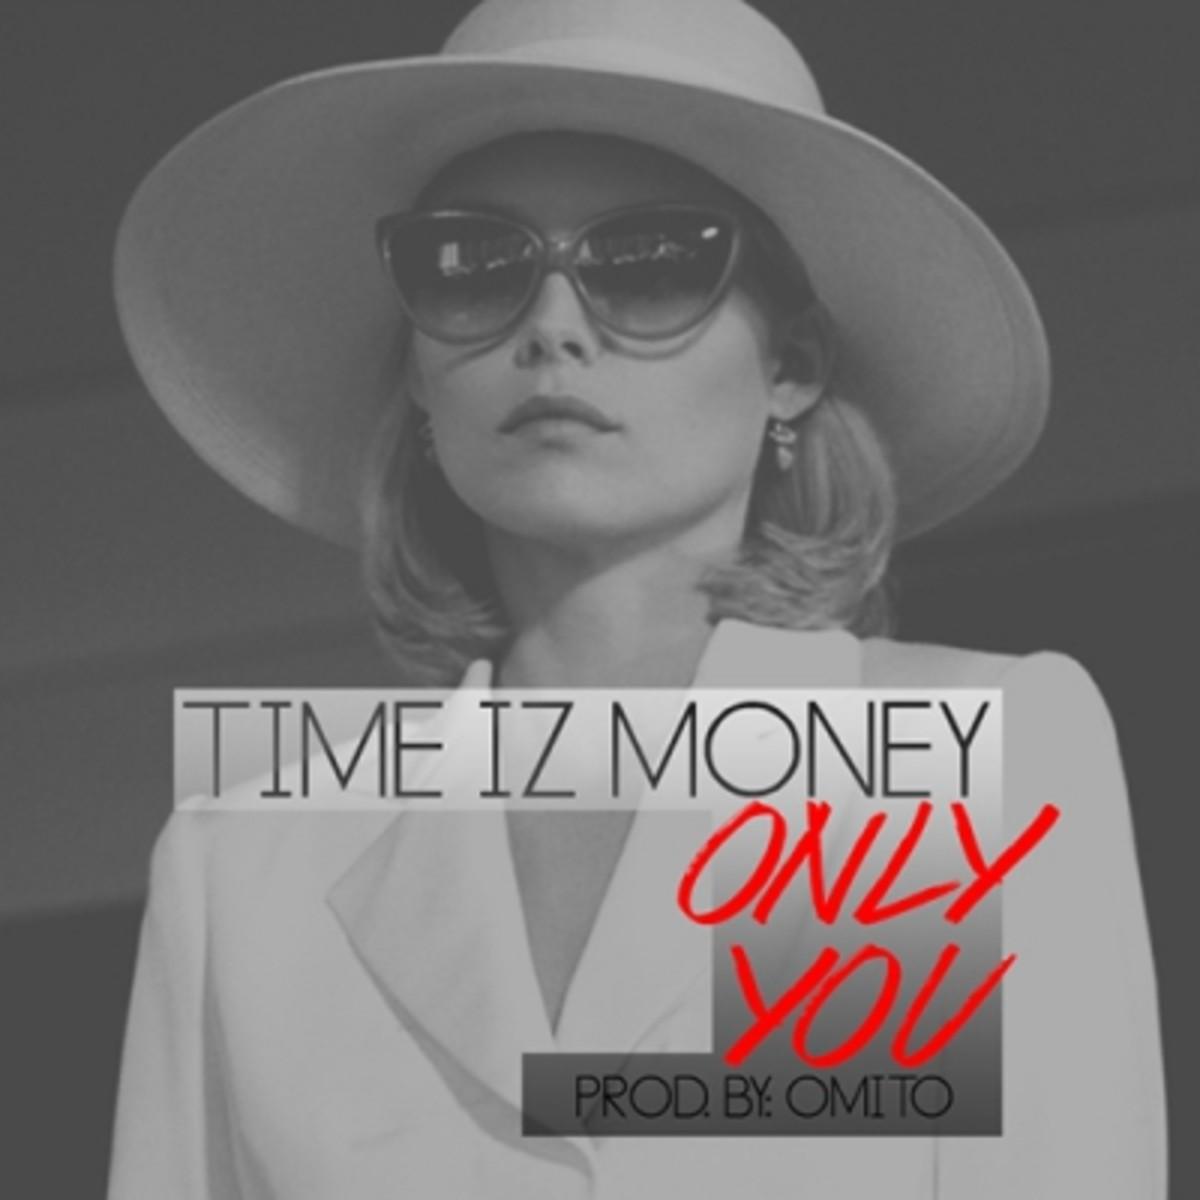 time-iz-money-only-you.jpg